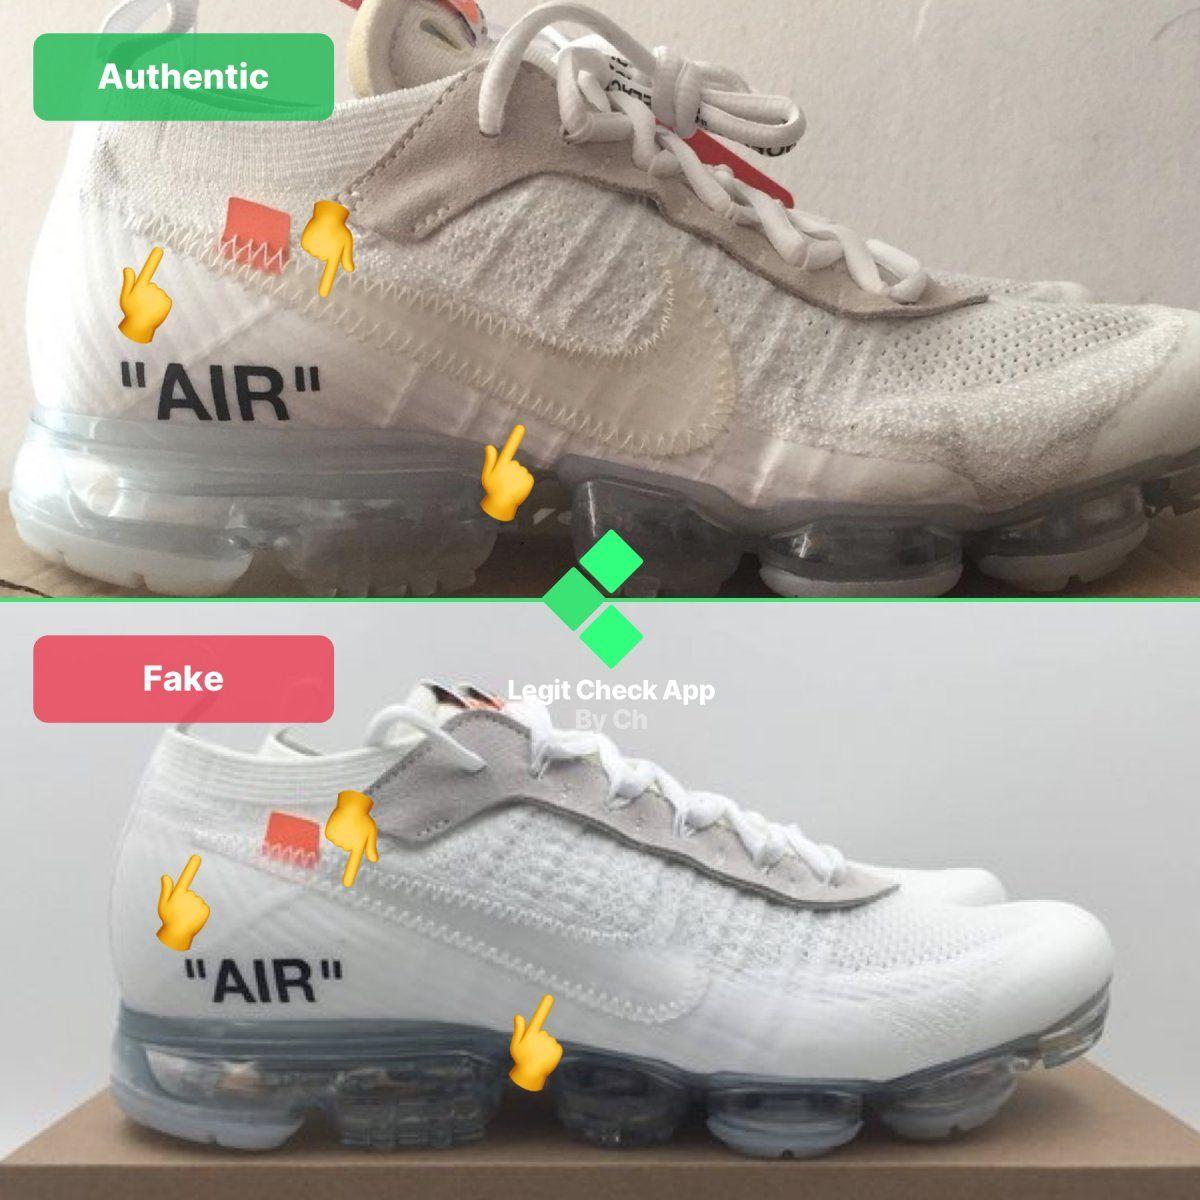 Off white shoes, Nike swoosh logo